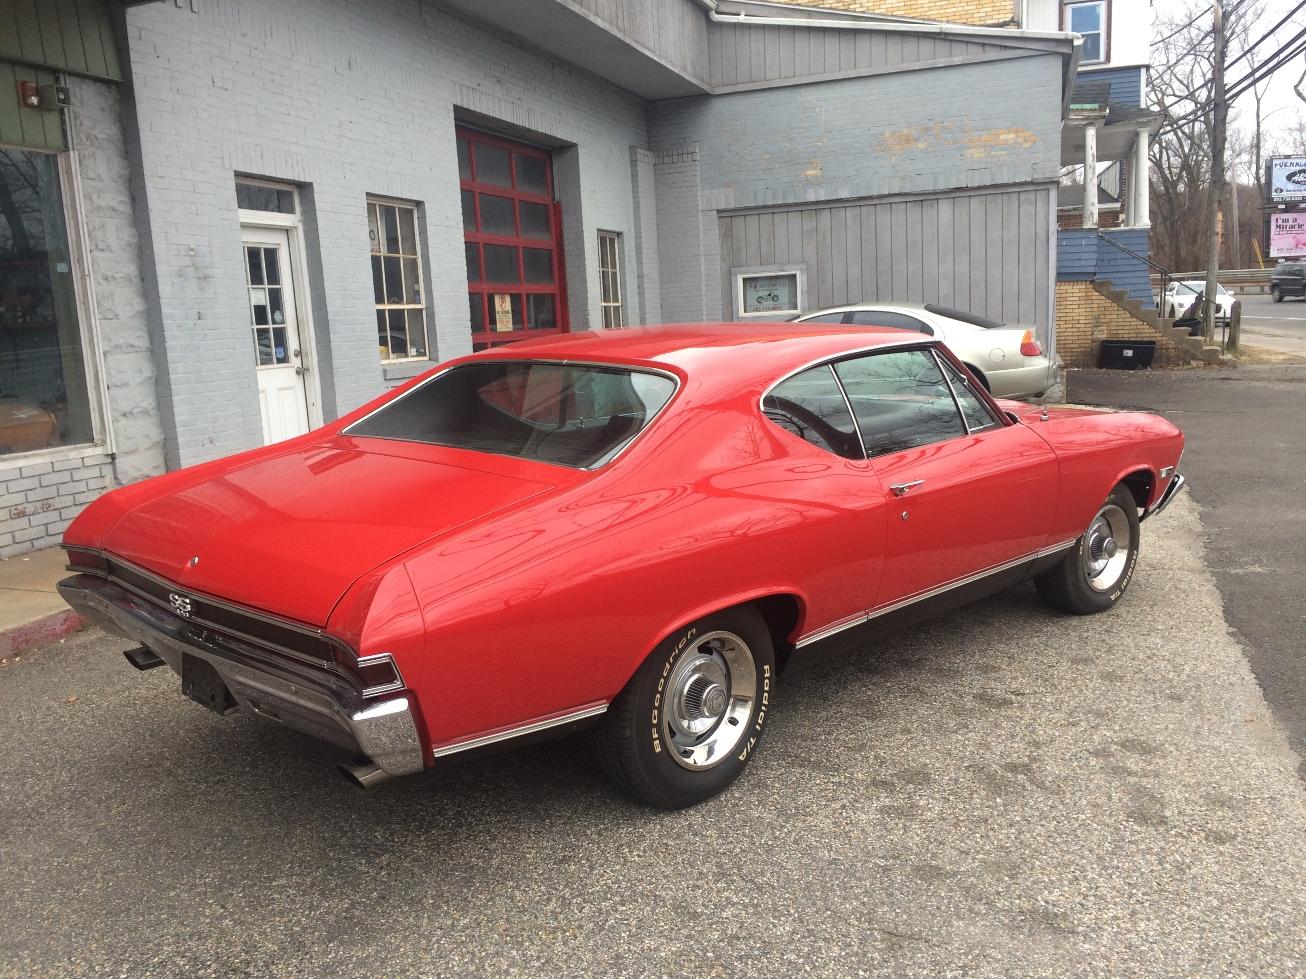 34 Motor Co LLC | classic cars - 1968 Chevelle SS396